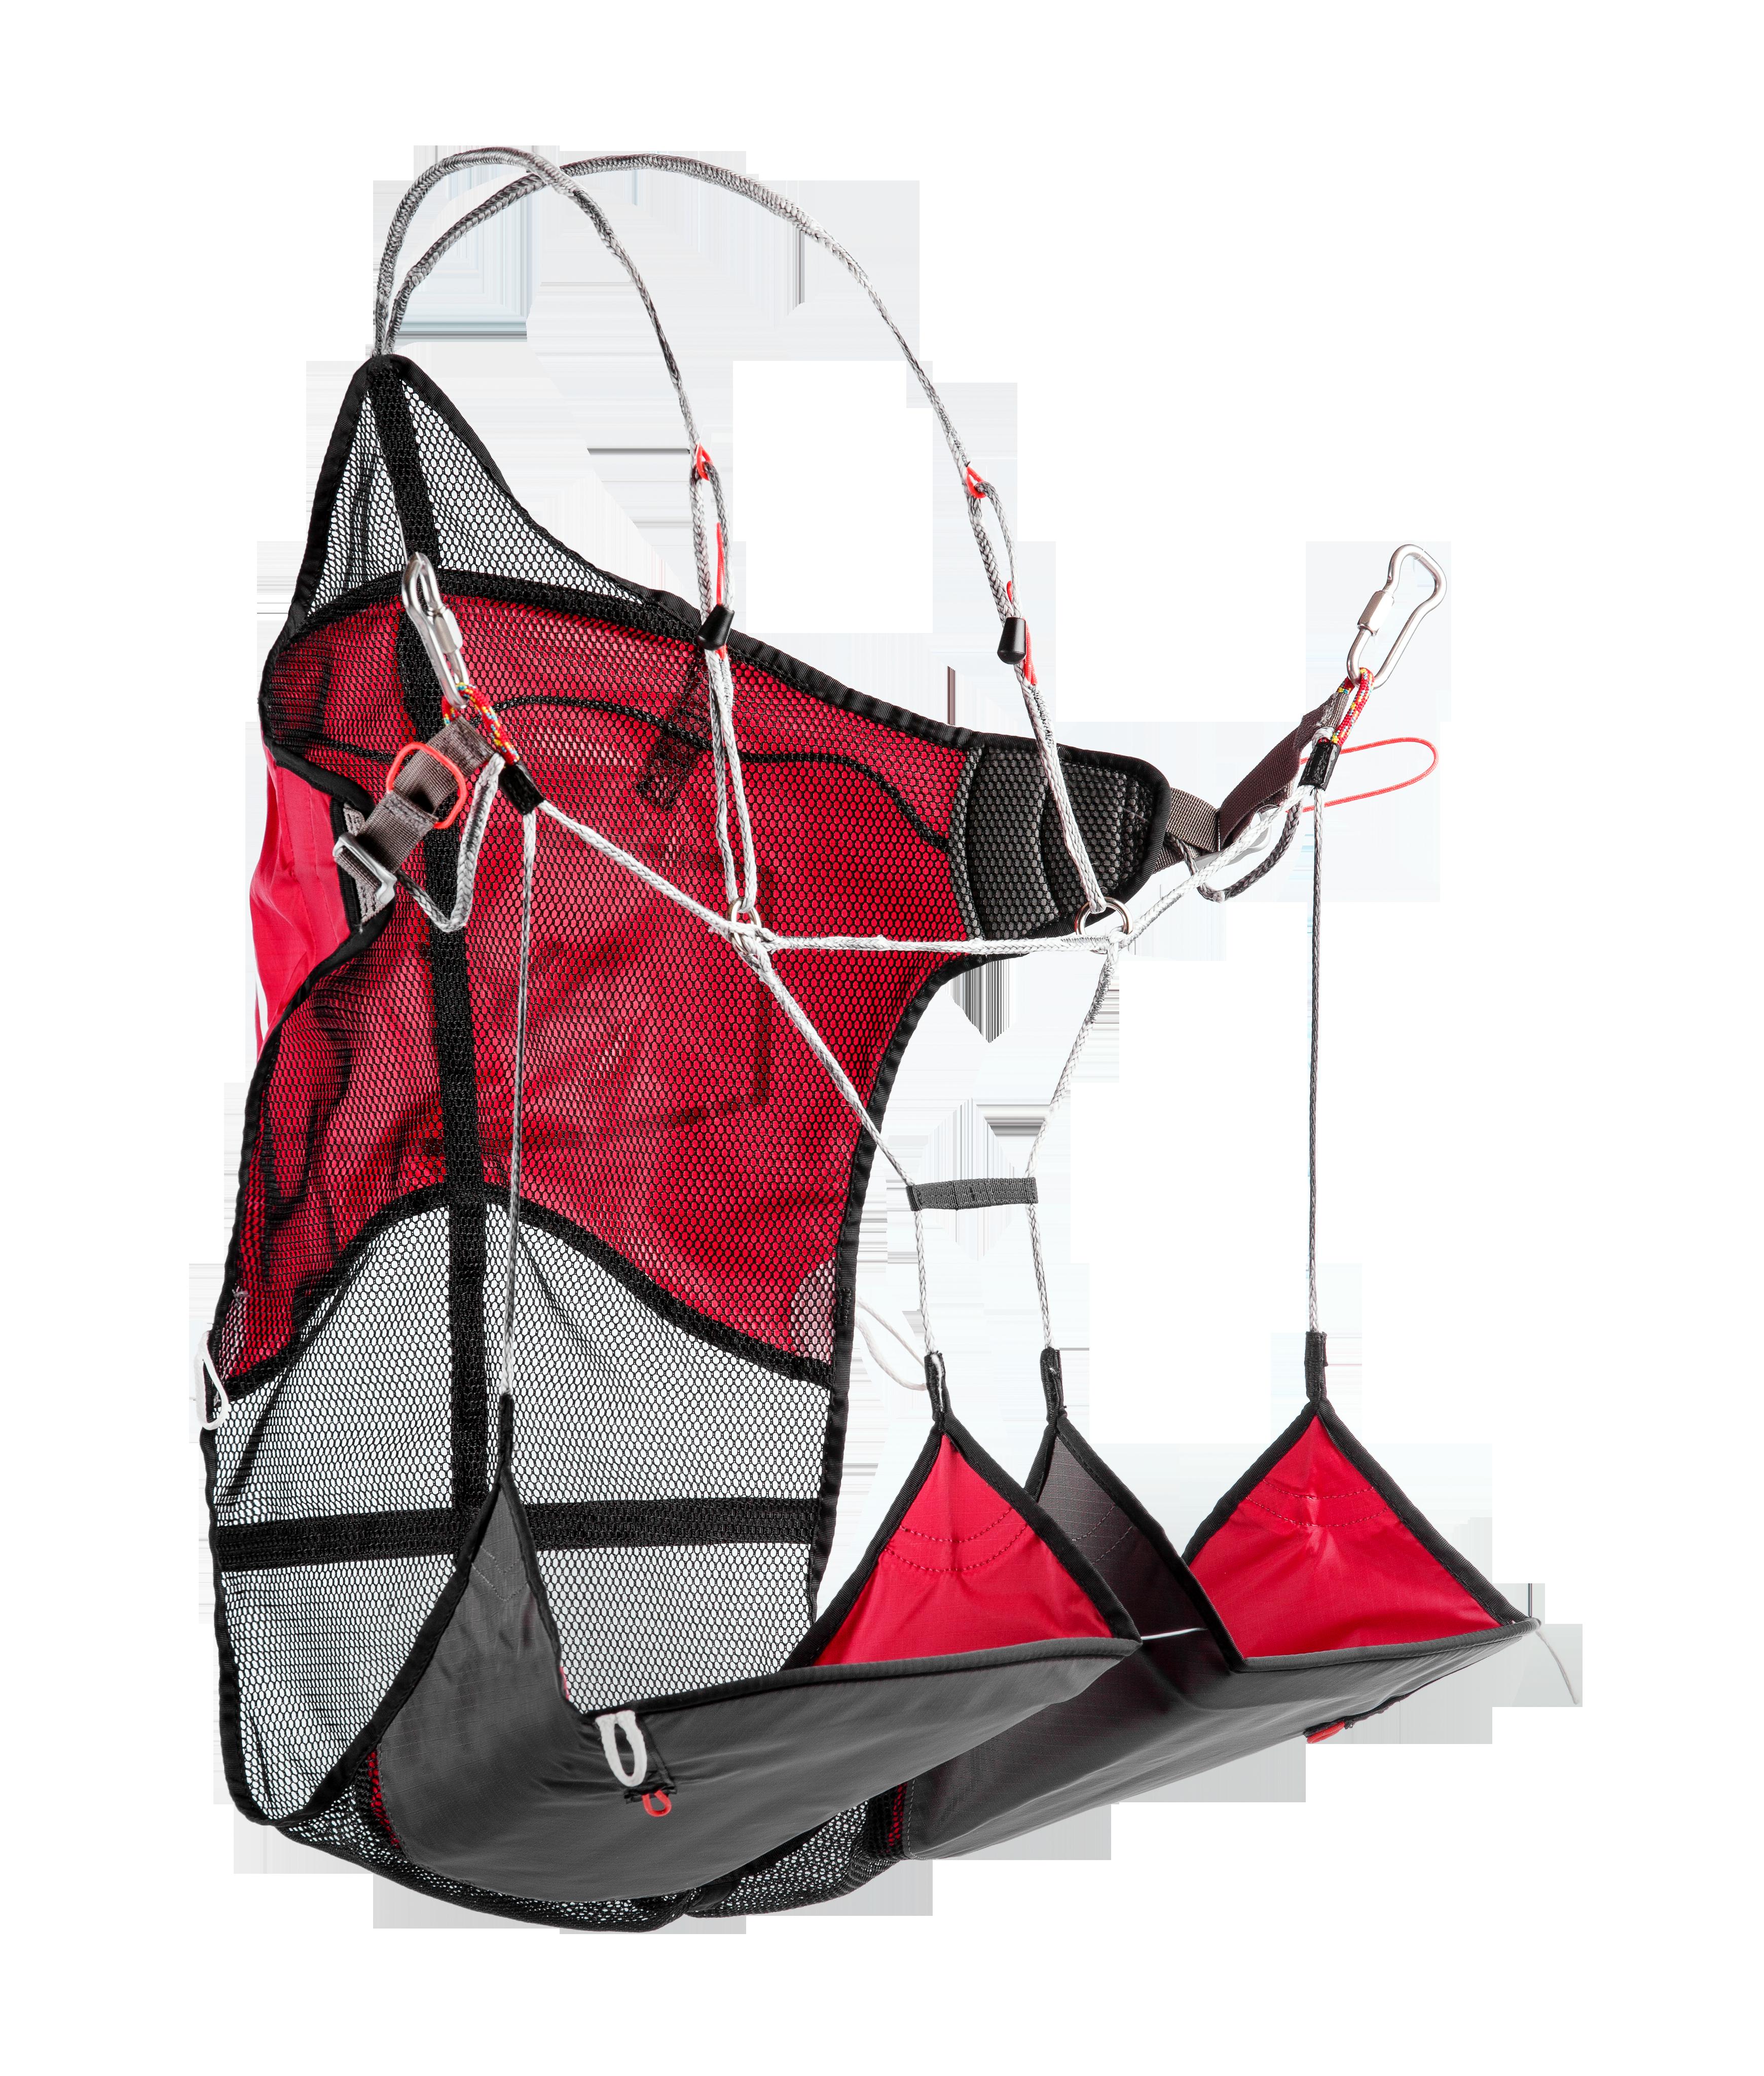 NOVA Performance Paragliders - Harnesses